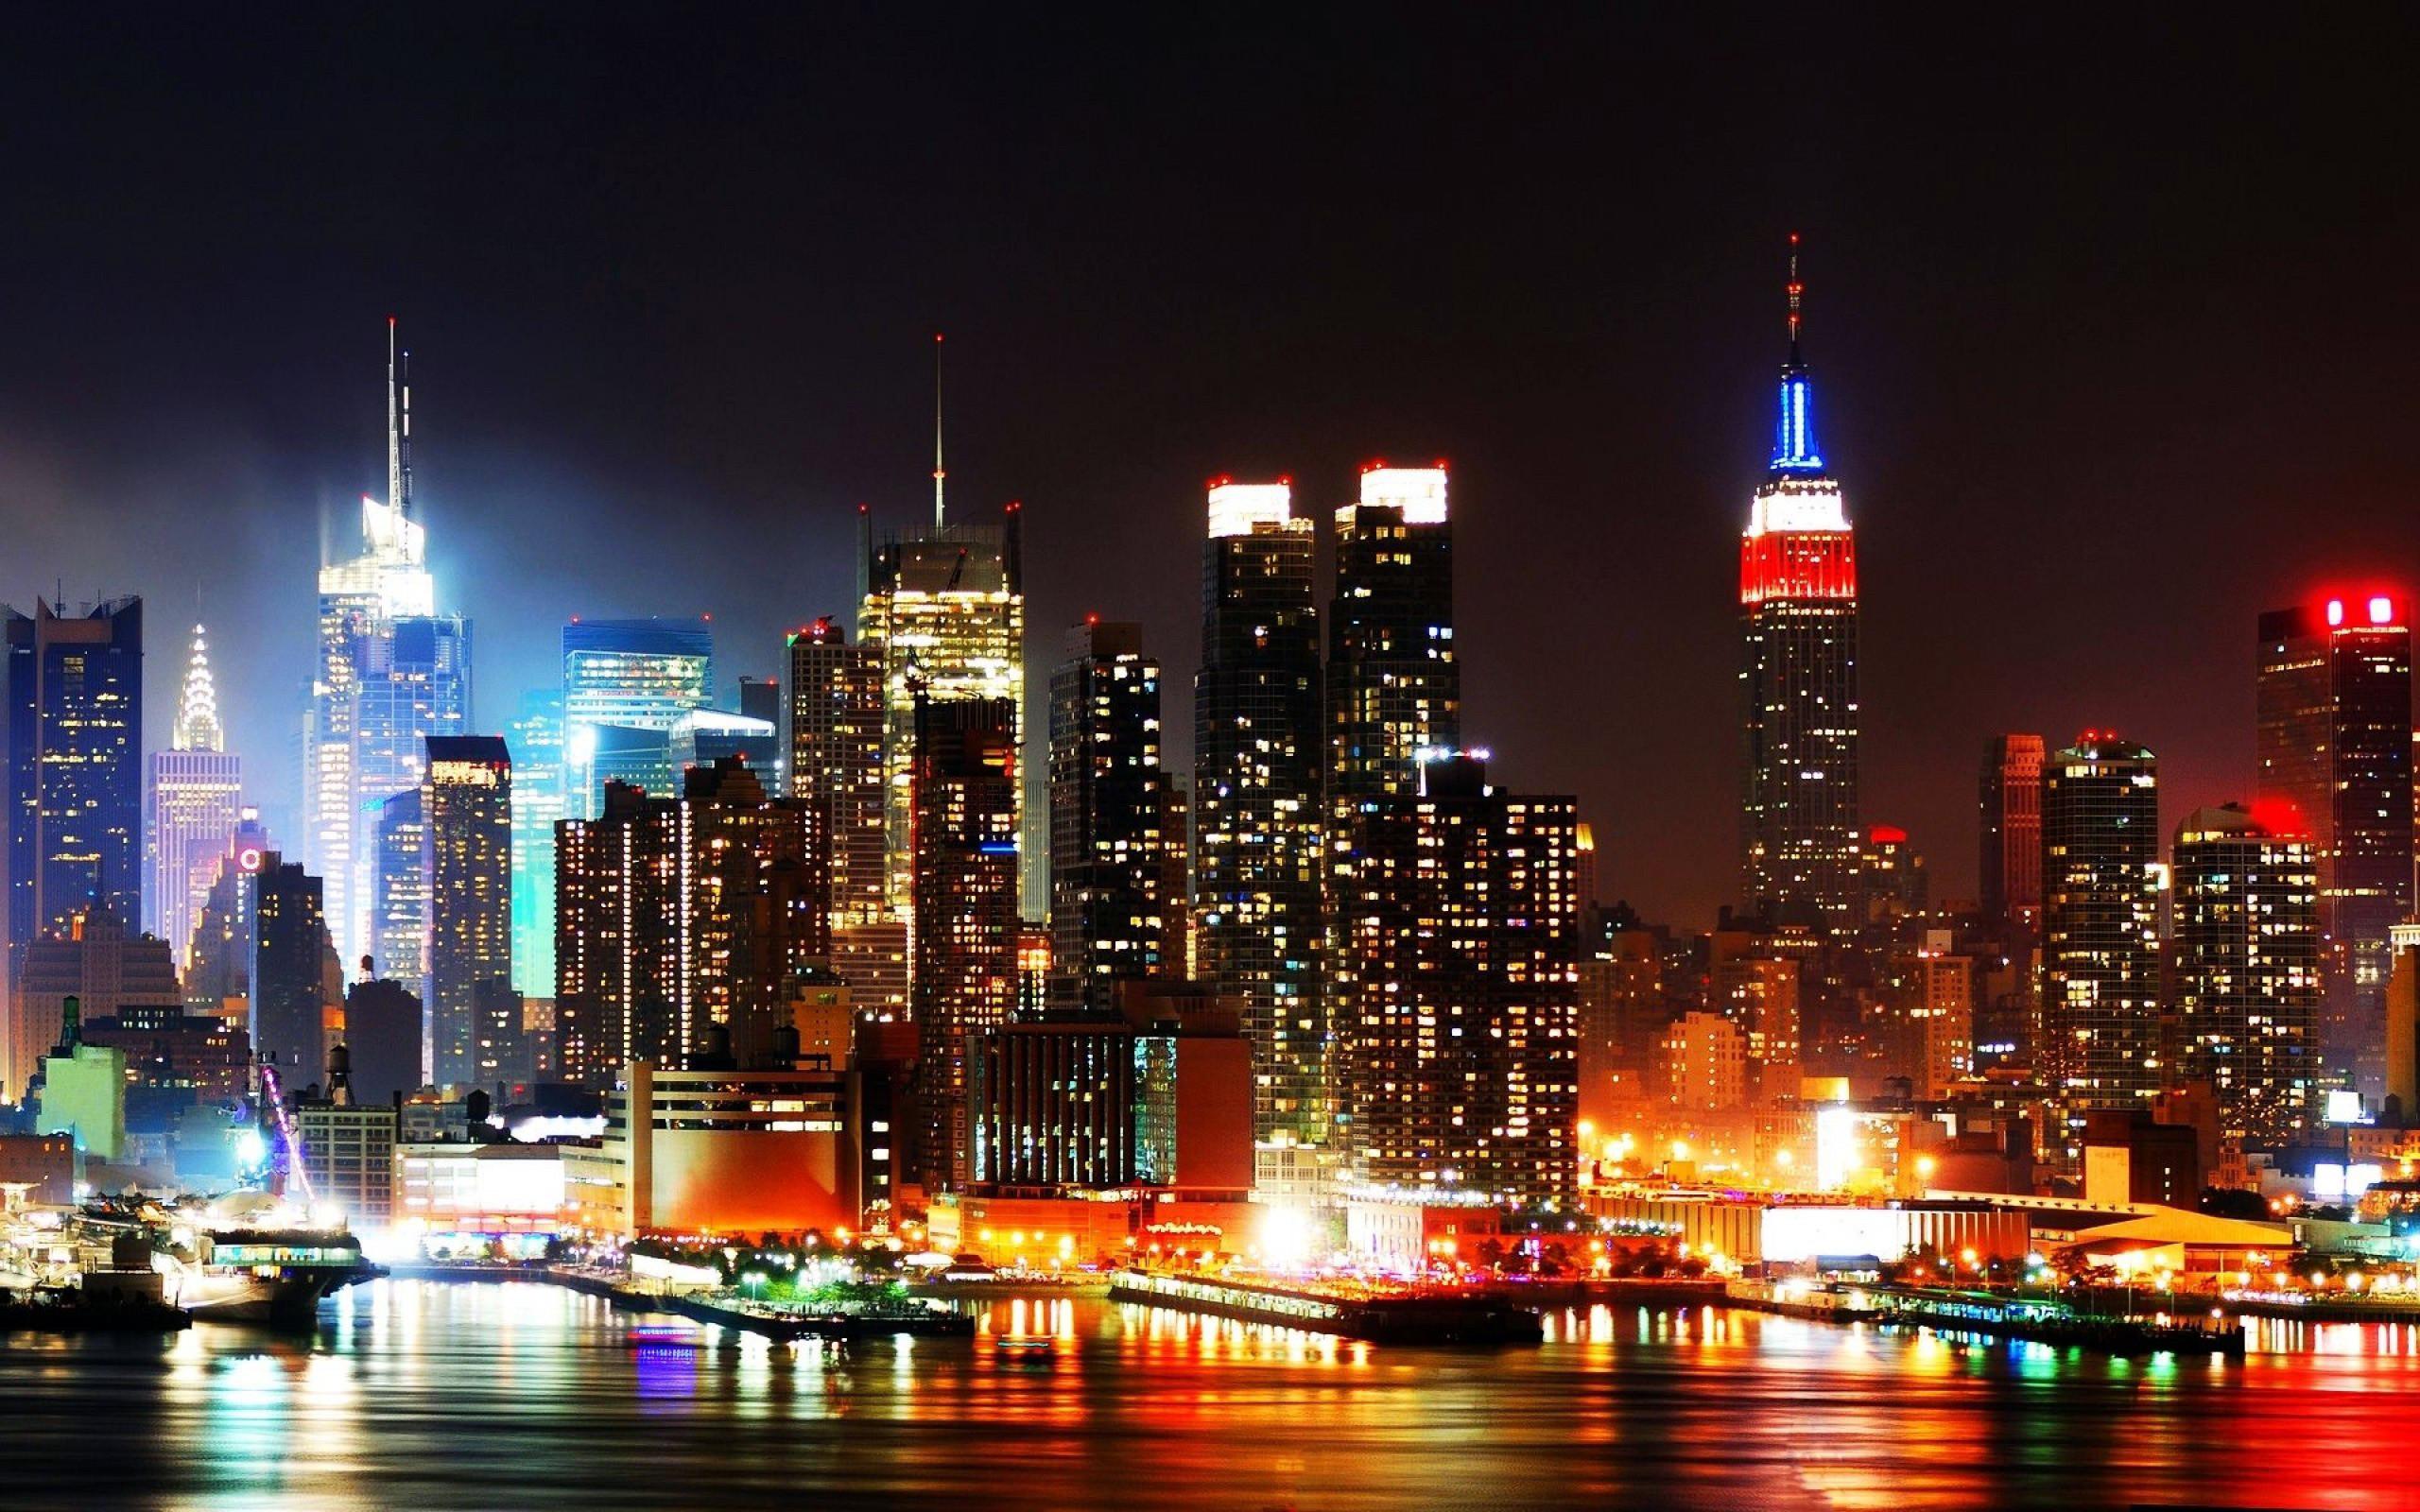 High Resolution New York Skyline at Night Wallpaper HD 21 City .